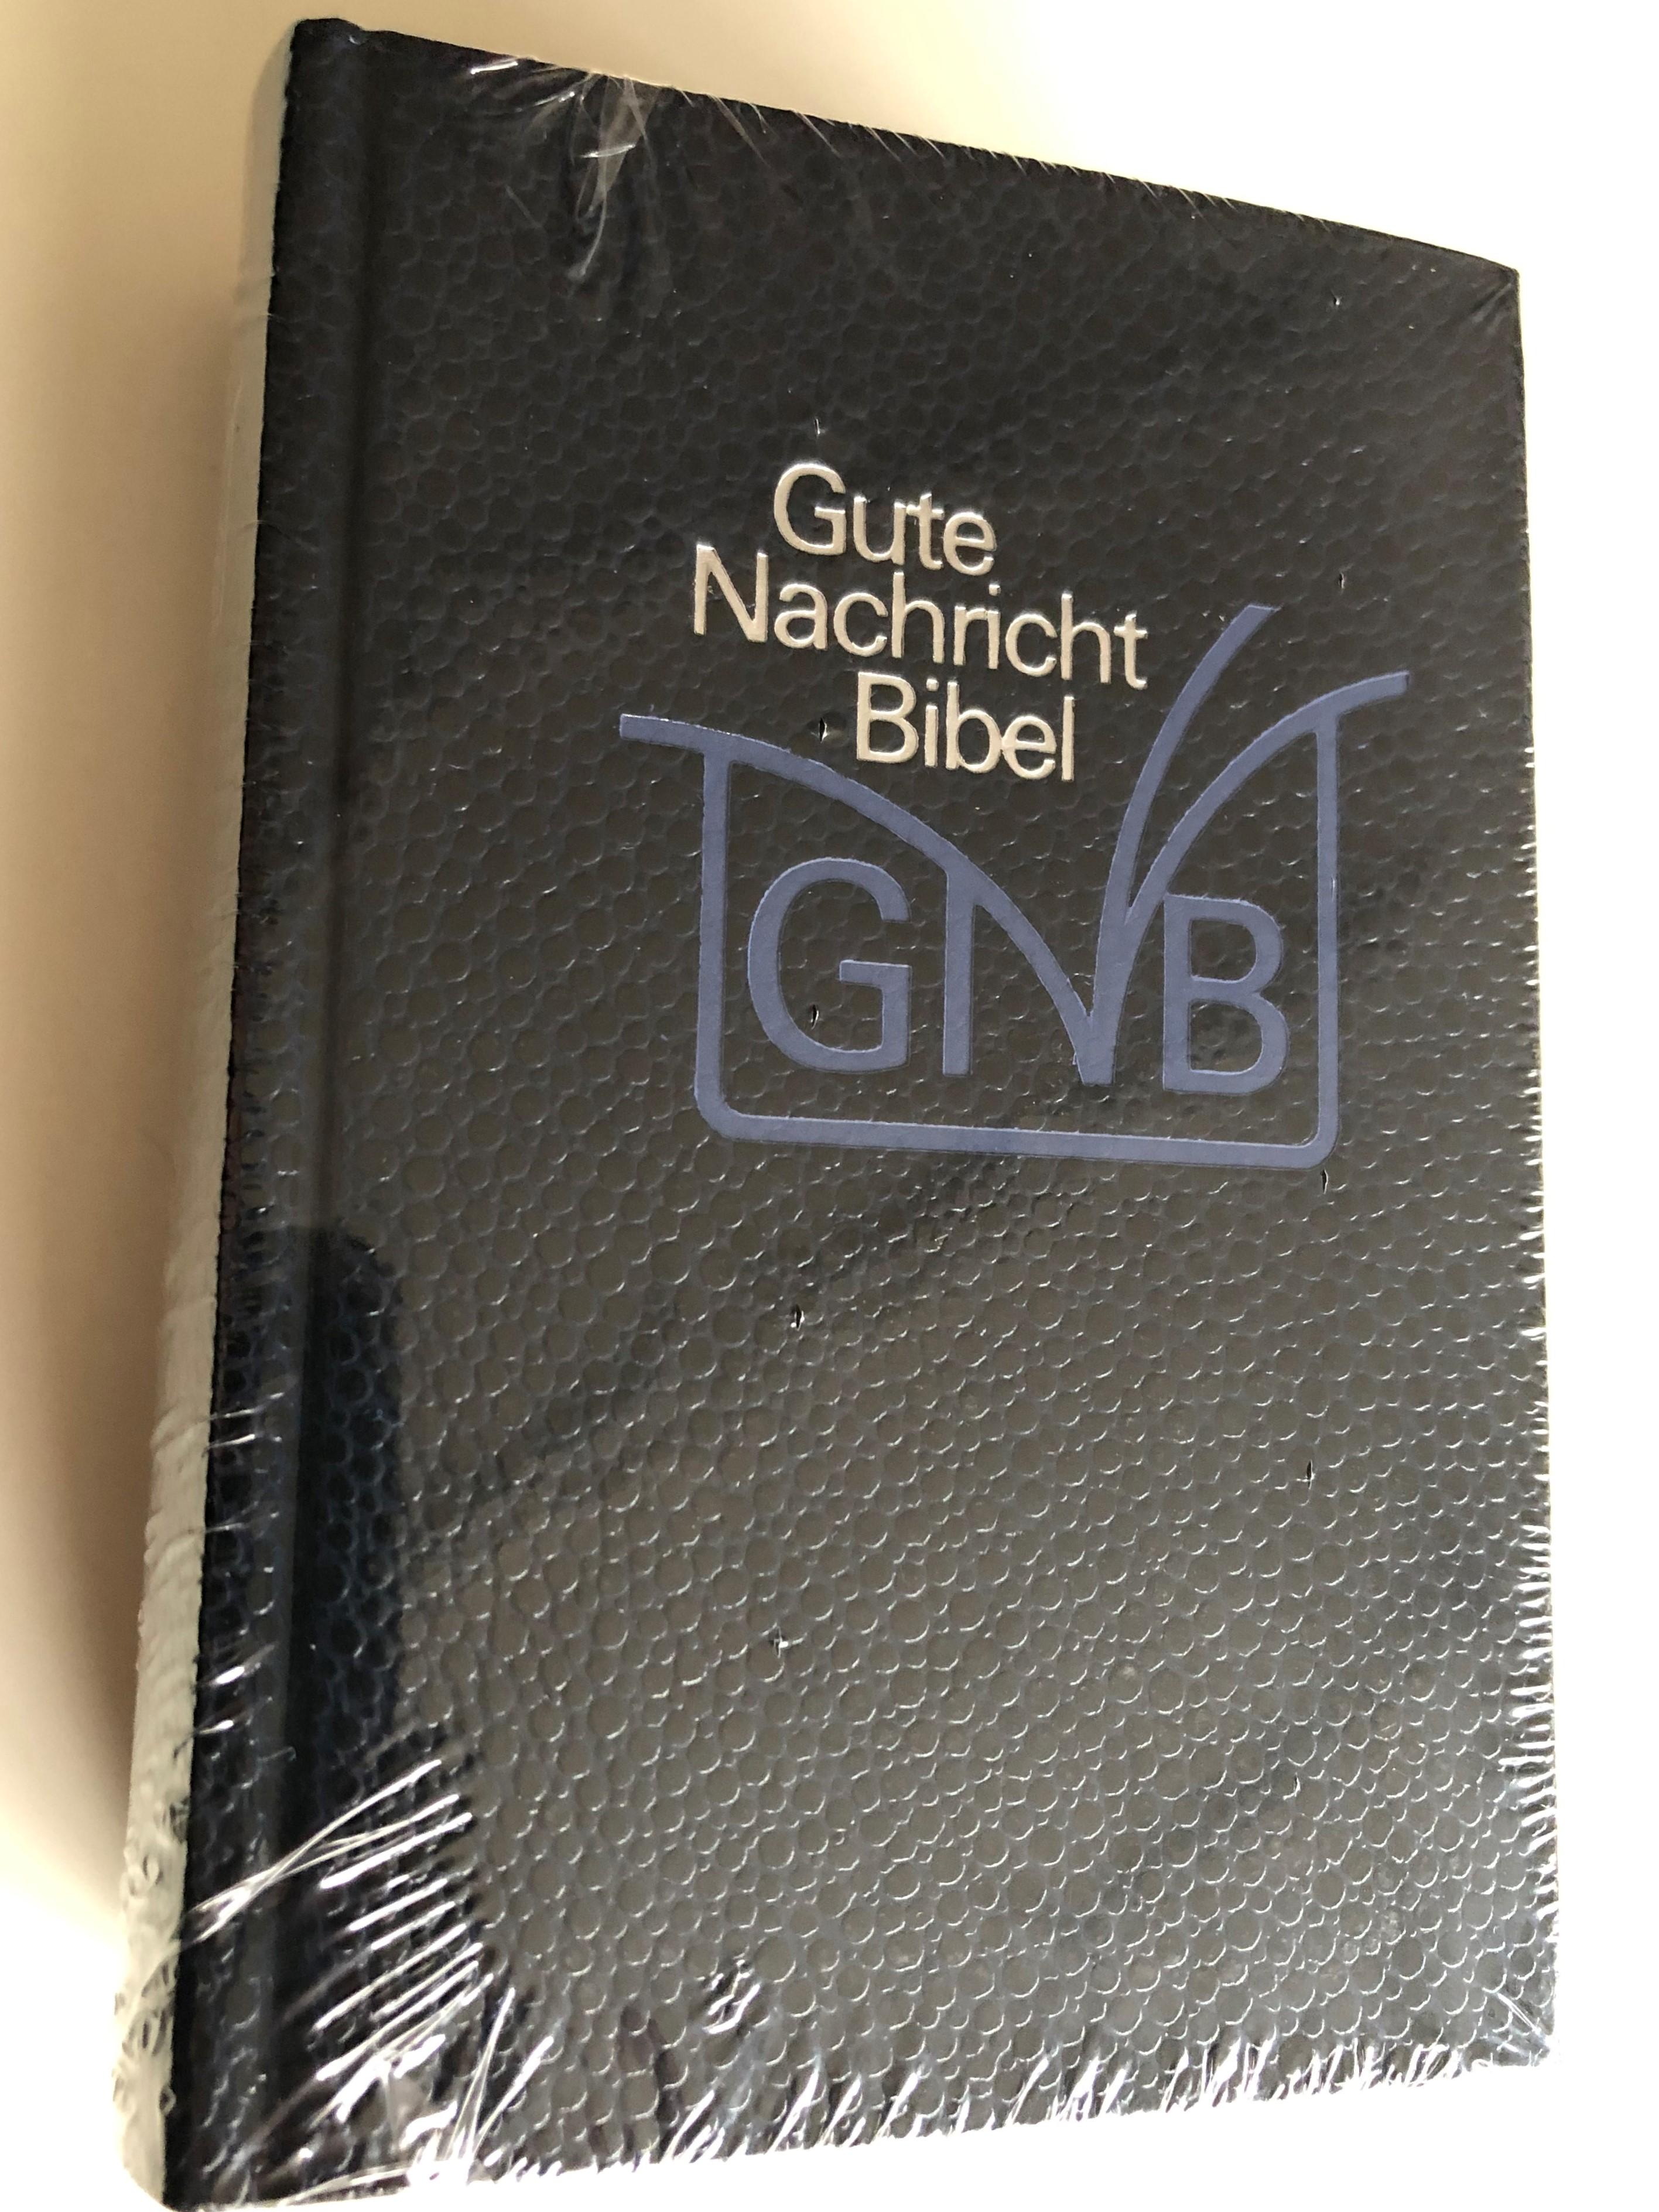 gute-nachricht-bibel-german-language-good-news-bible-with-mini-cd-rom-audio-bible-4.jpg